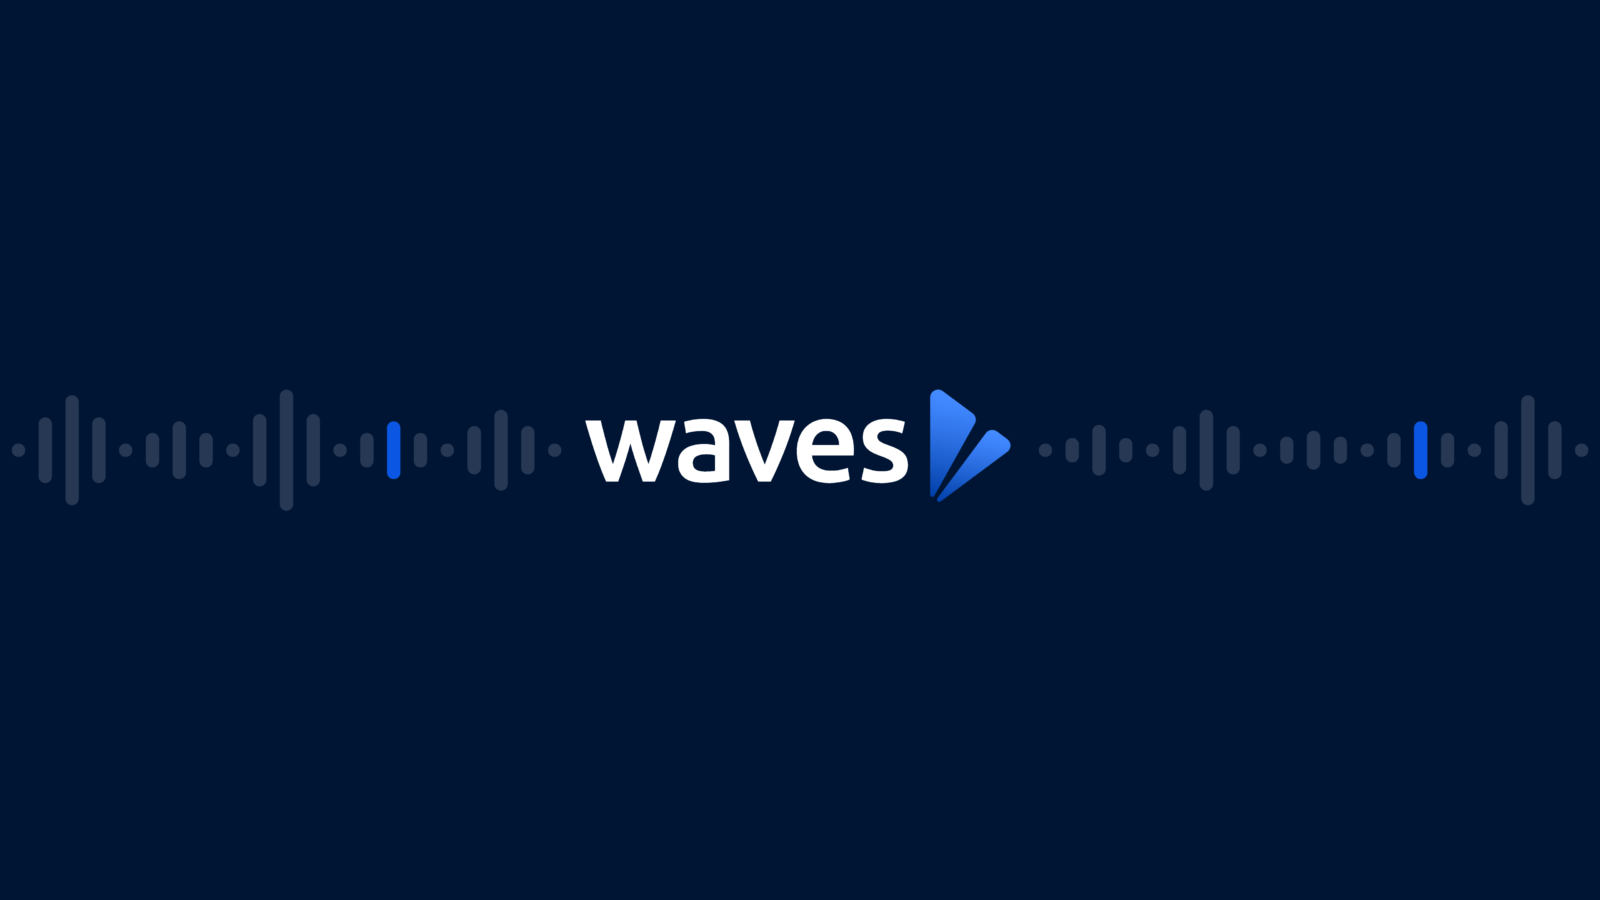 Waves Media, a Boston based video production company